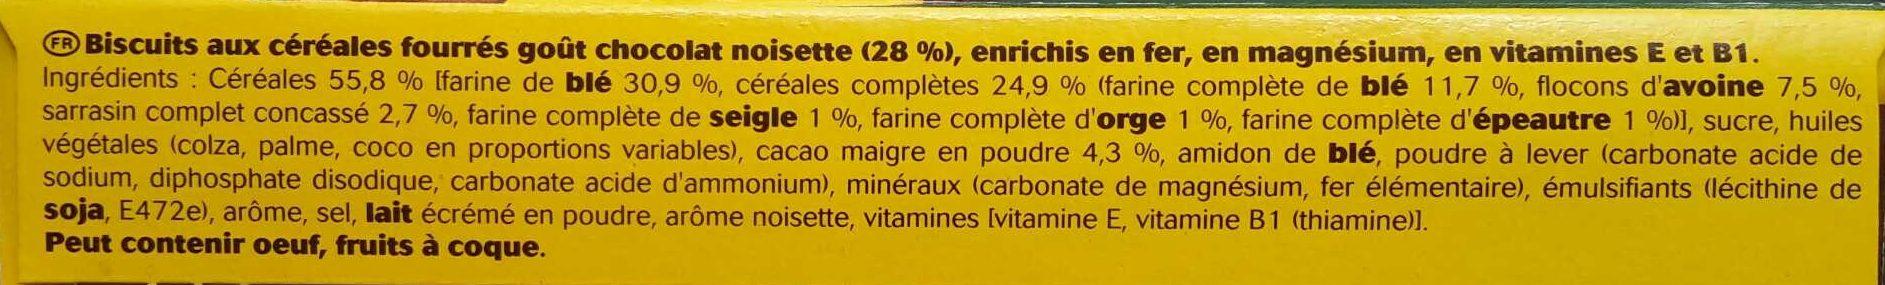 BelVita Duo Fourré goût Chocolat Noisette (maxi format) - Ingredients - fr